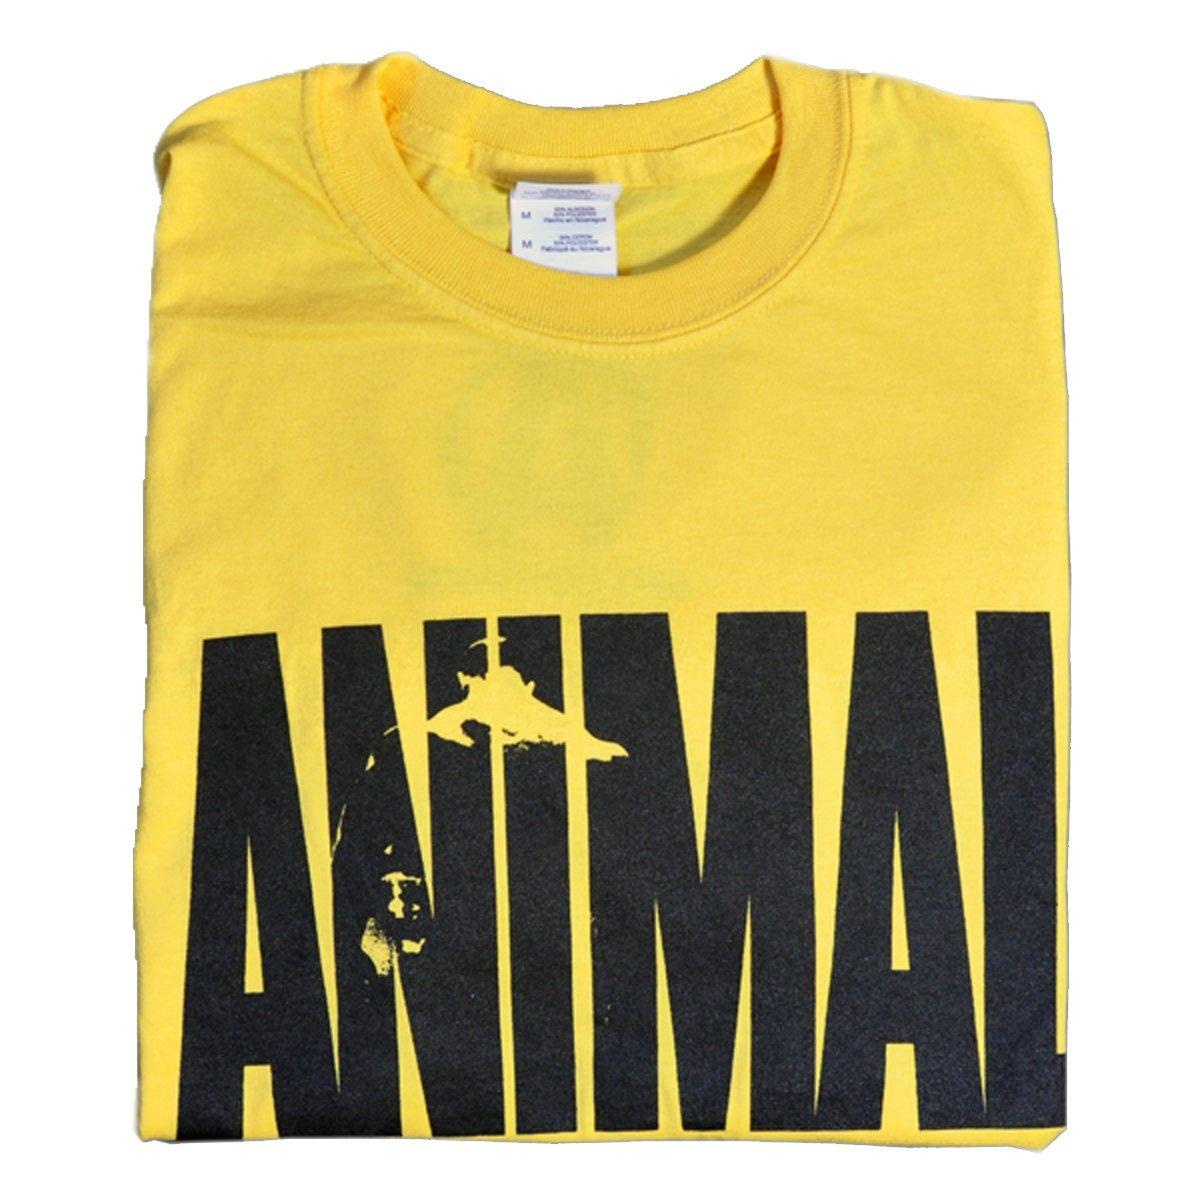 Universal Nutrition Yellow Animal Iconic T-Shirt Large